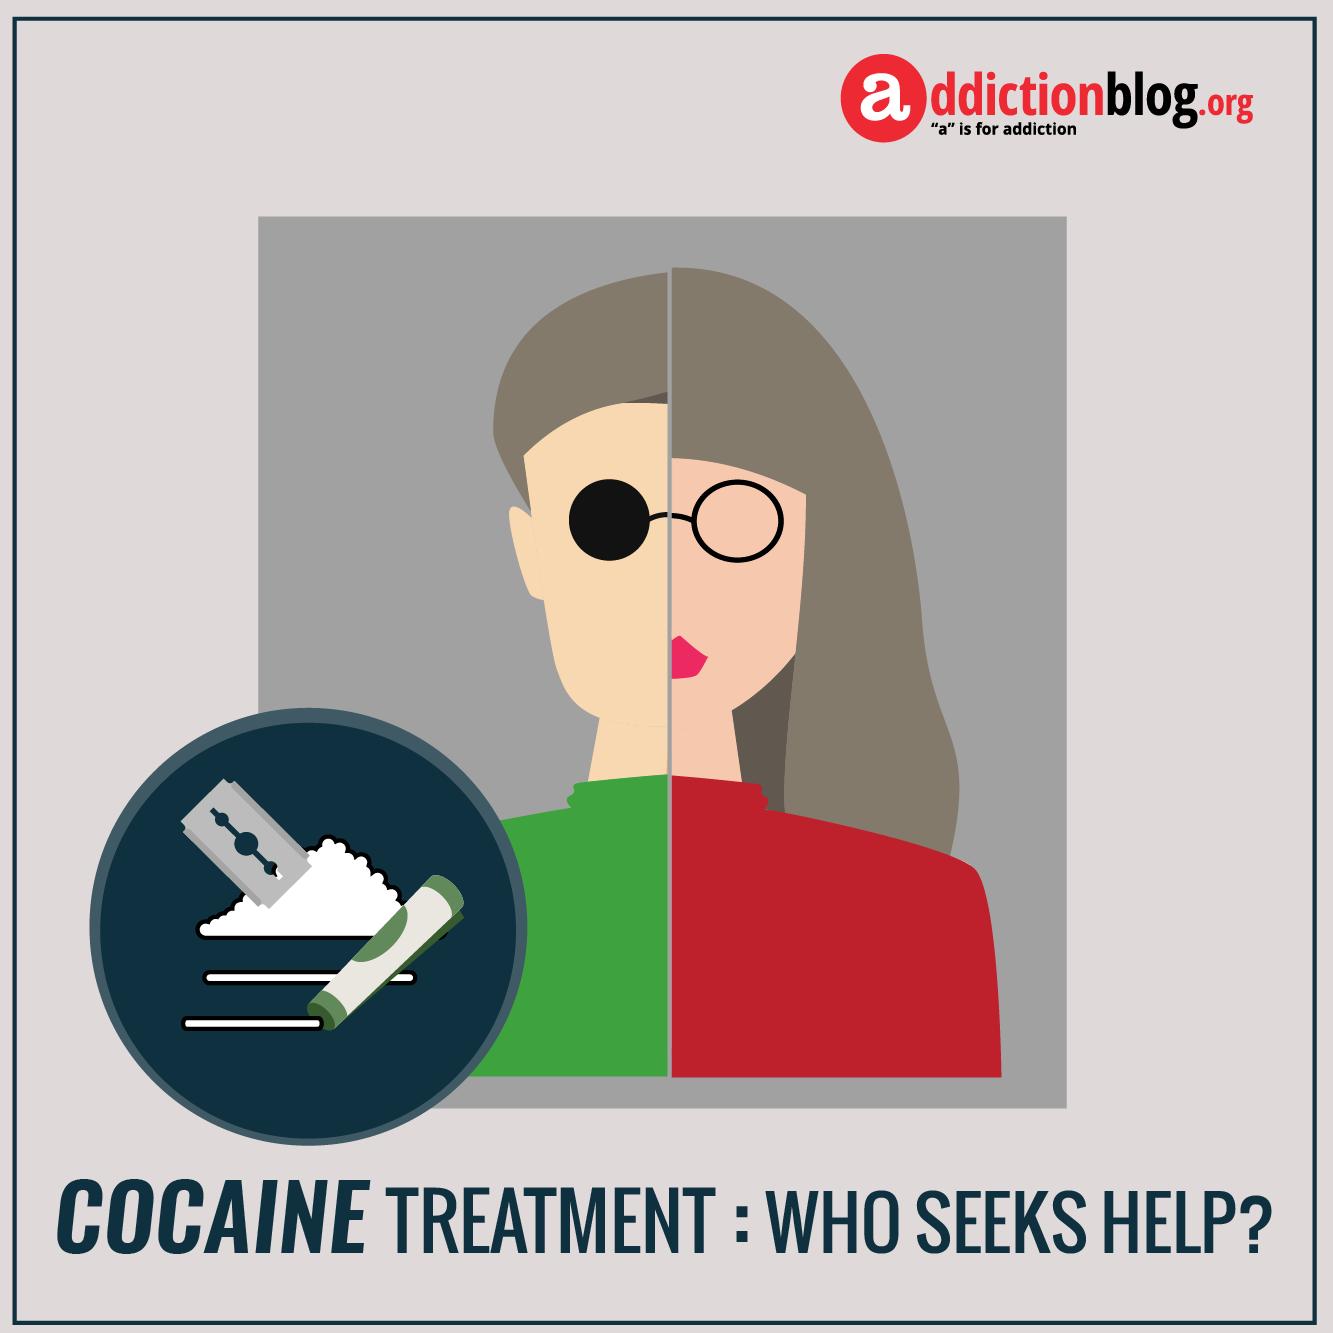 Cocaine addiction help: Who needs treatment? (INFOGRAPHIC)